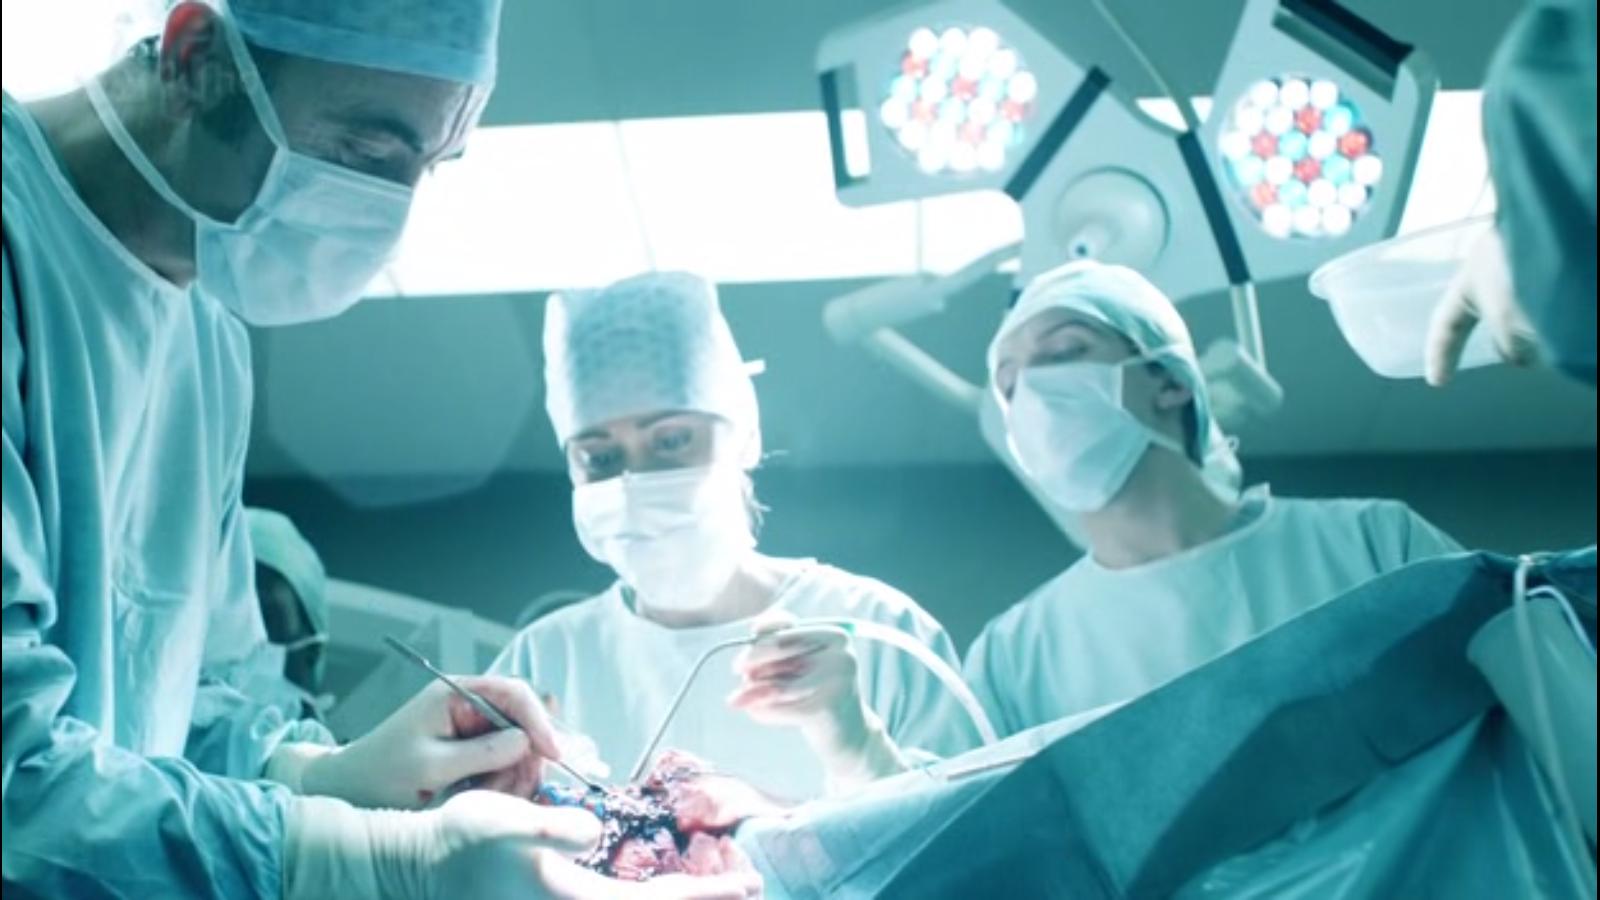 Neurosurgeon Salary and Education Information 1600x900